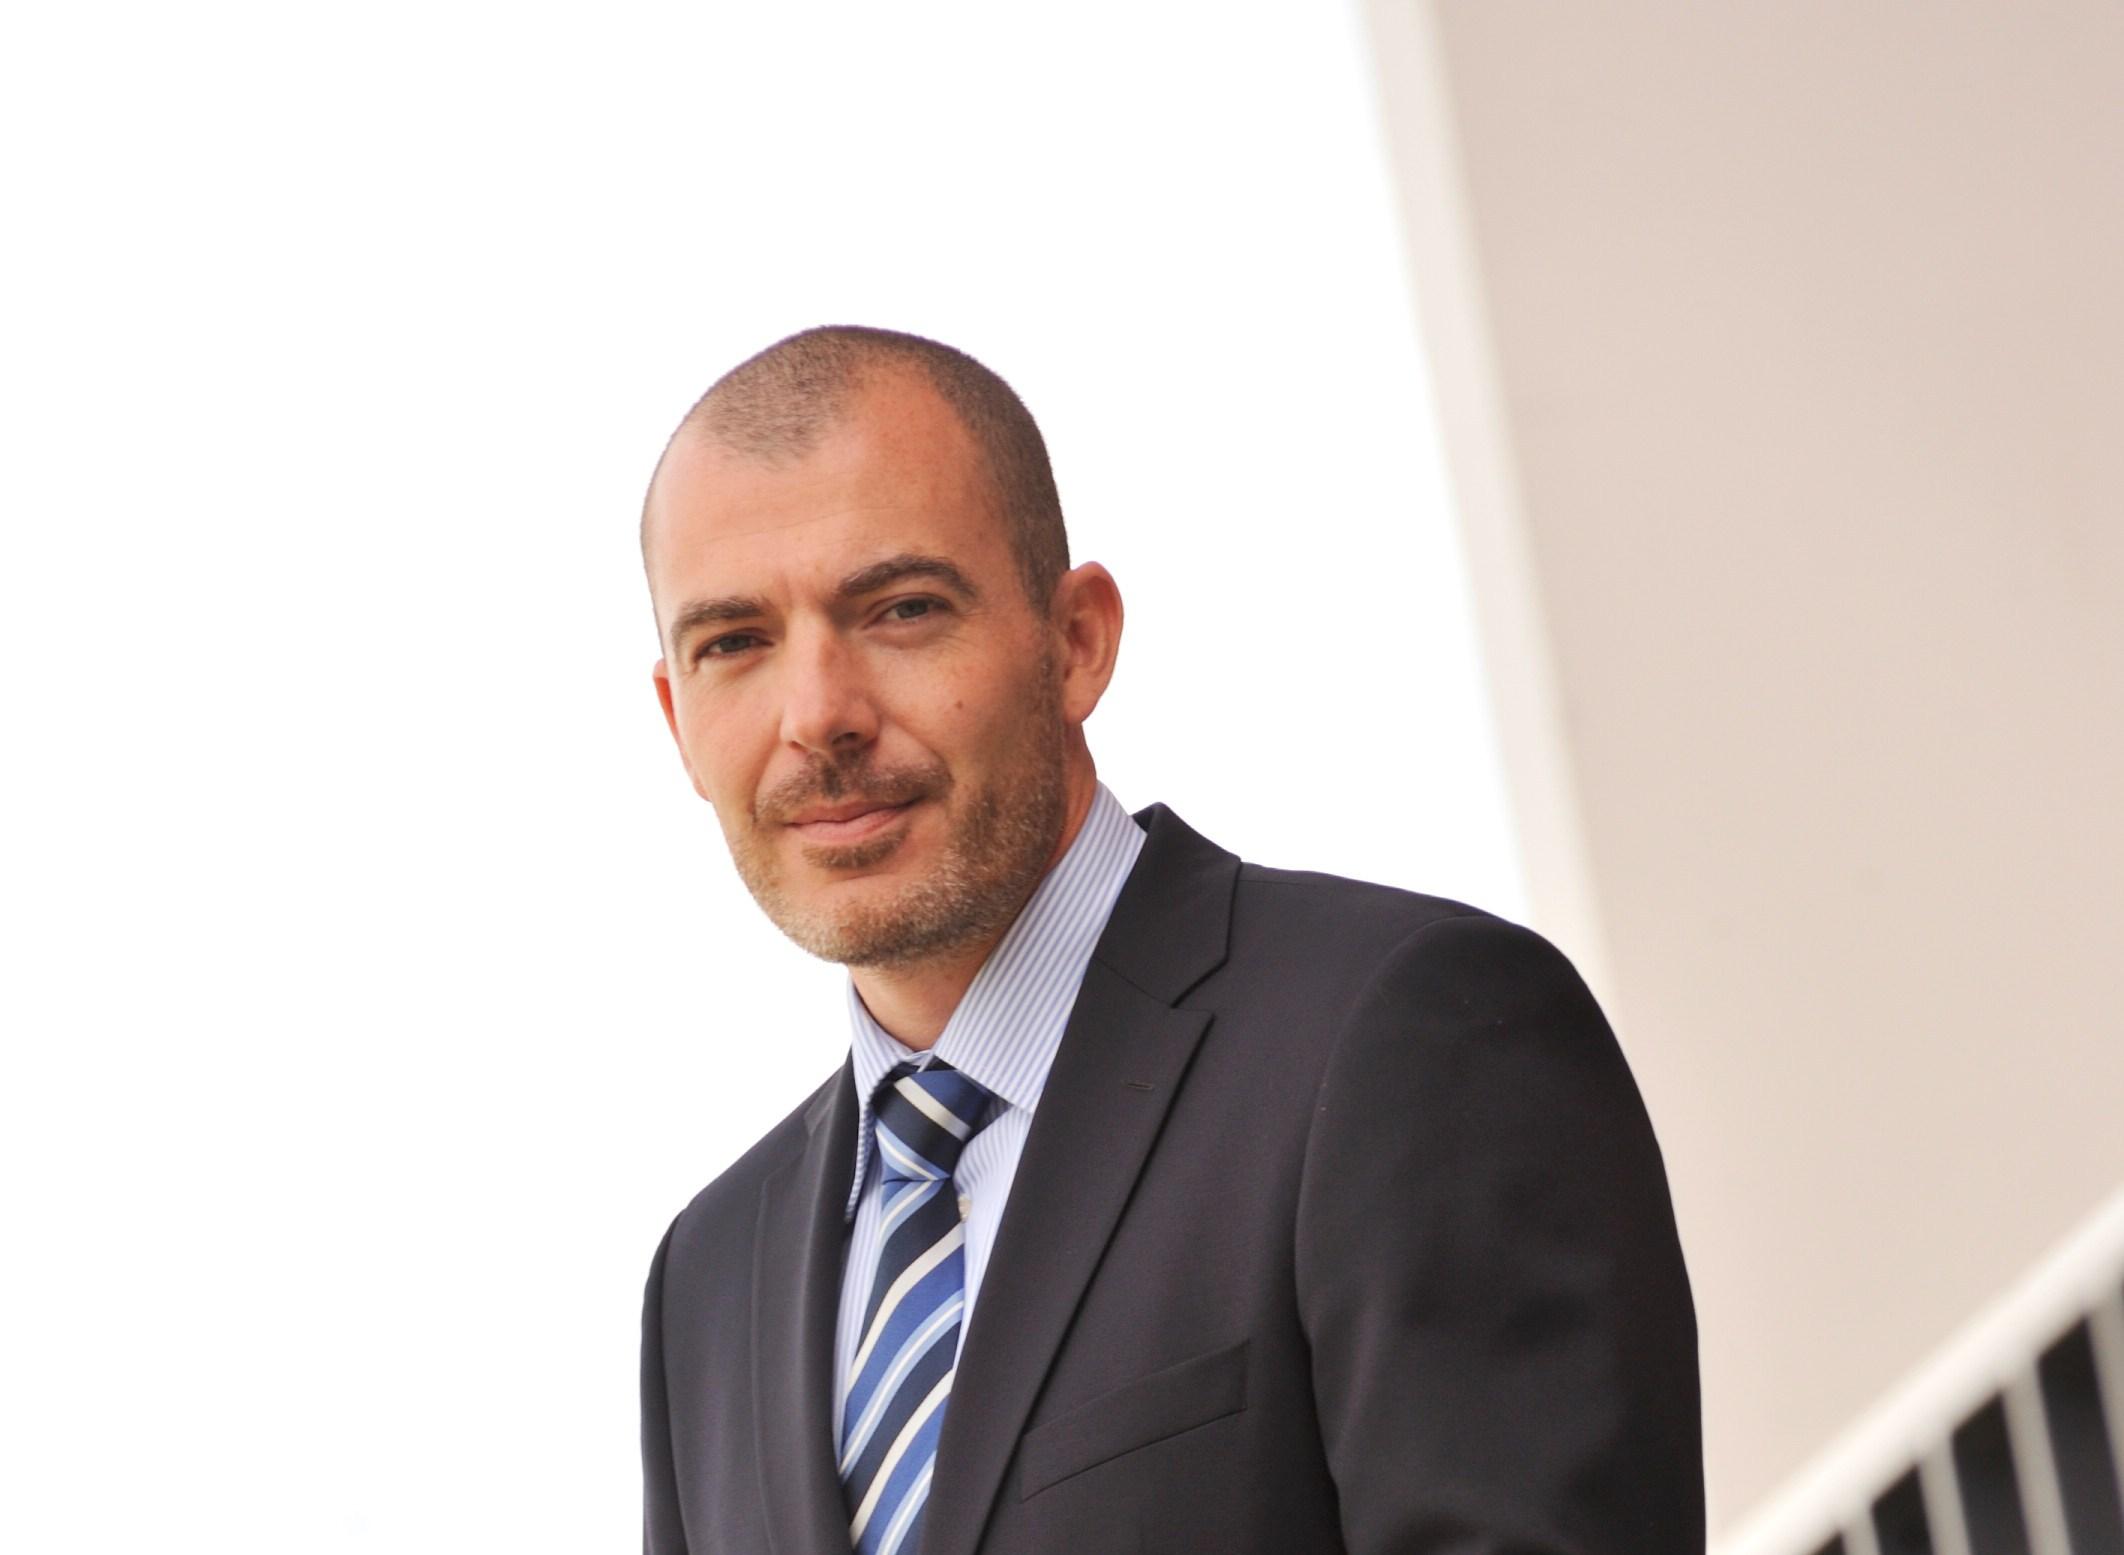 photo : Yoann JOUBERT, président de Realites